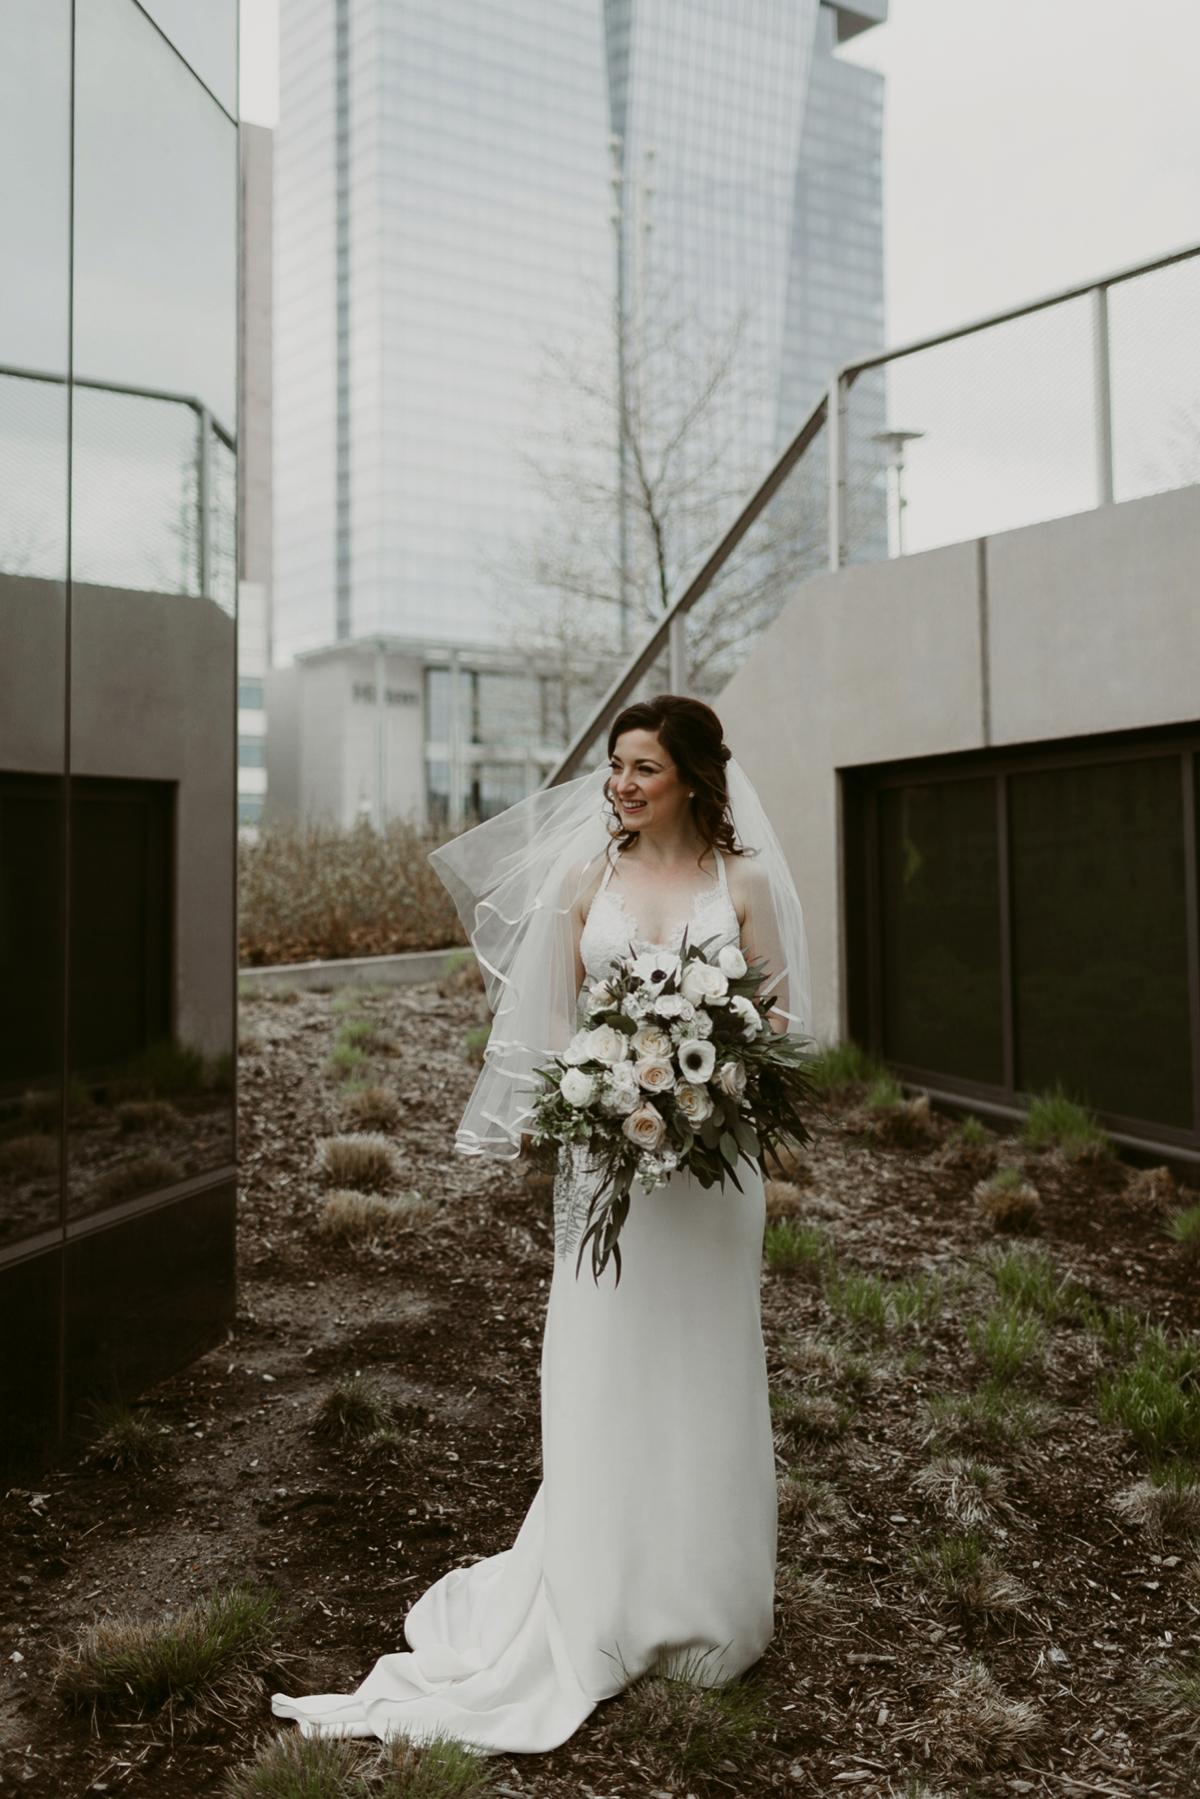 Rachel+Michael_Lake-Erie-Building-Cleveland-Wedding_M+J-Photographers-130.jpg